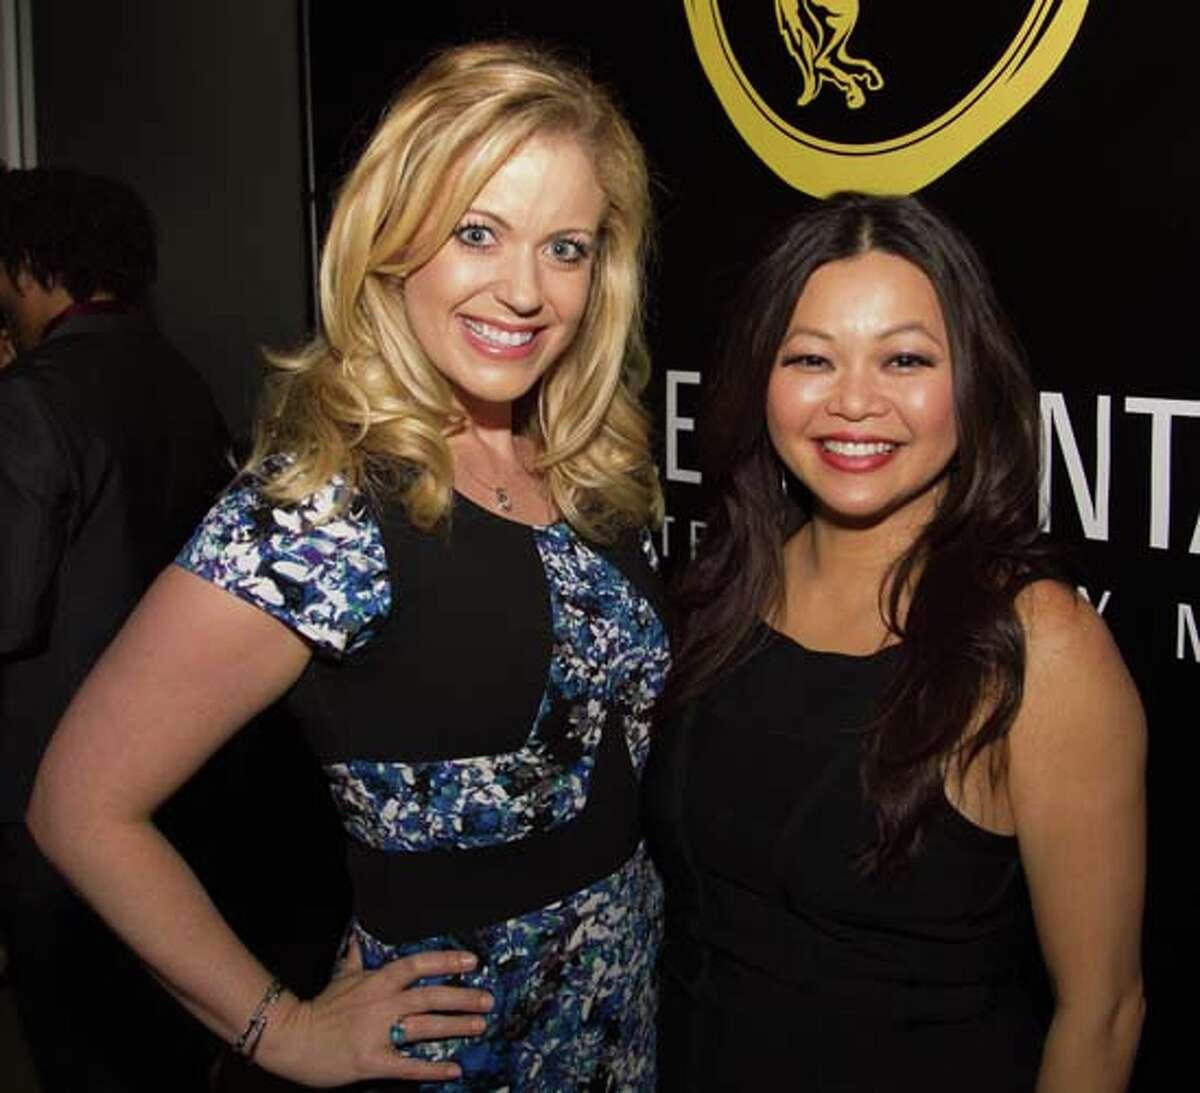 Maggie Flecknoe, left, and Chloe Dao